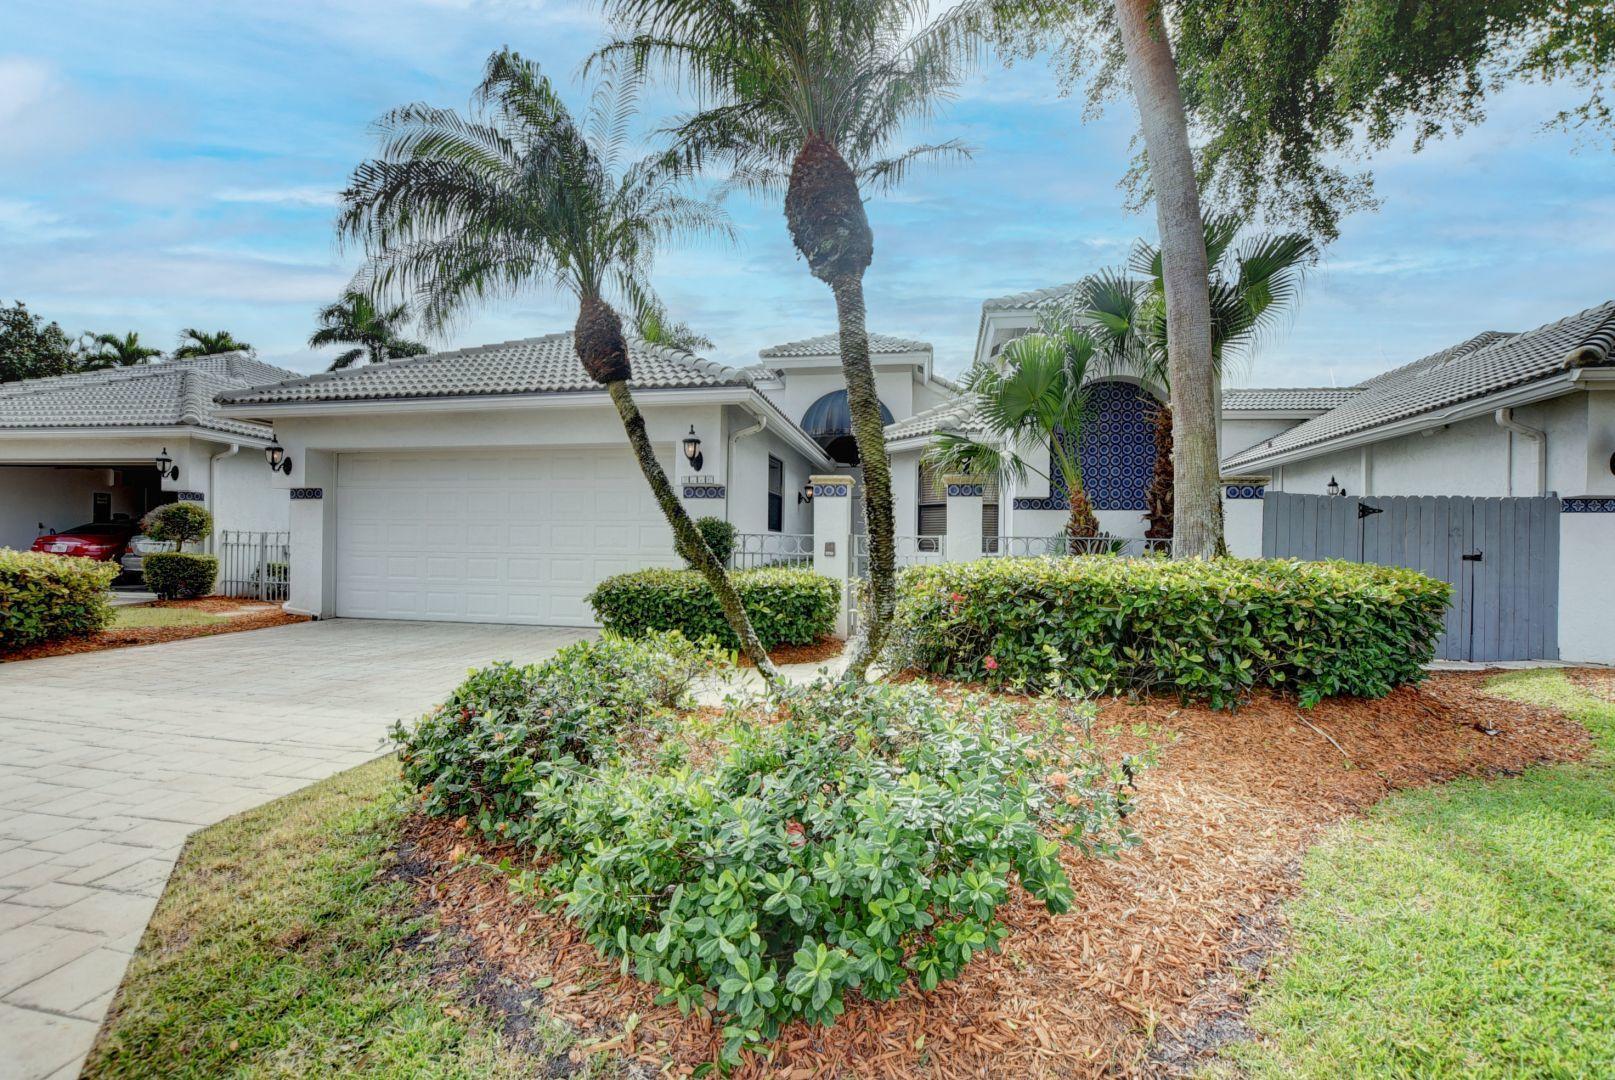 Home for sale in Broken Sound / Fairway Bend Boca Raton Florida